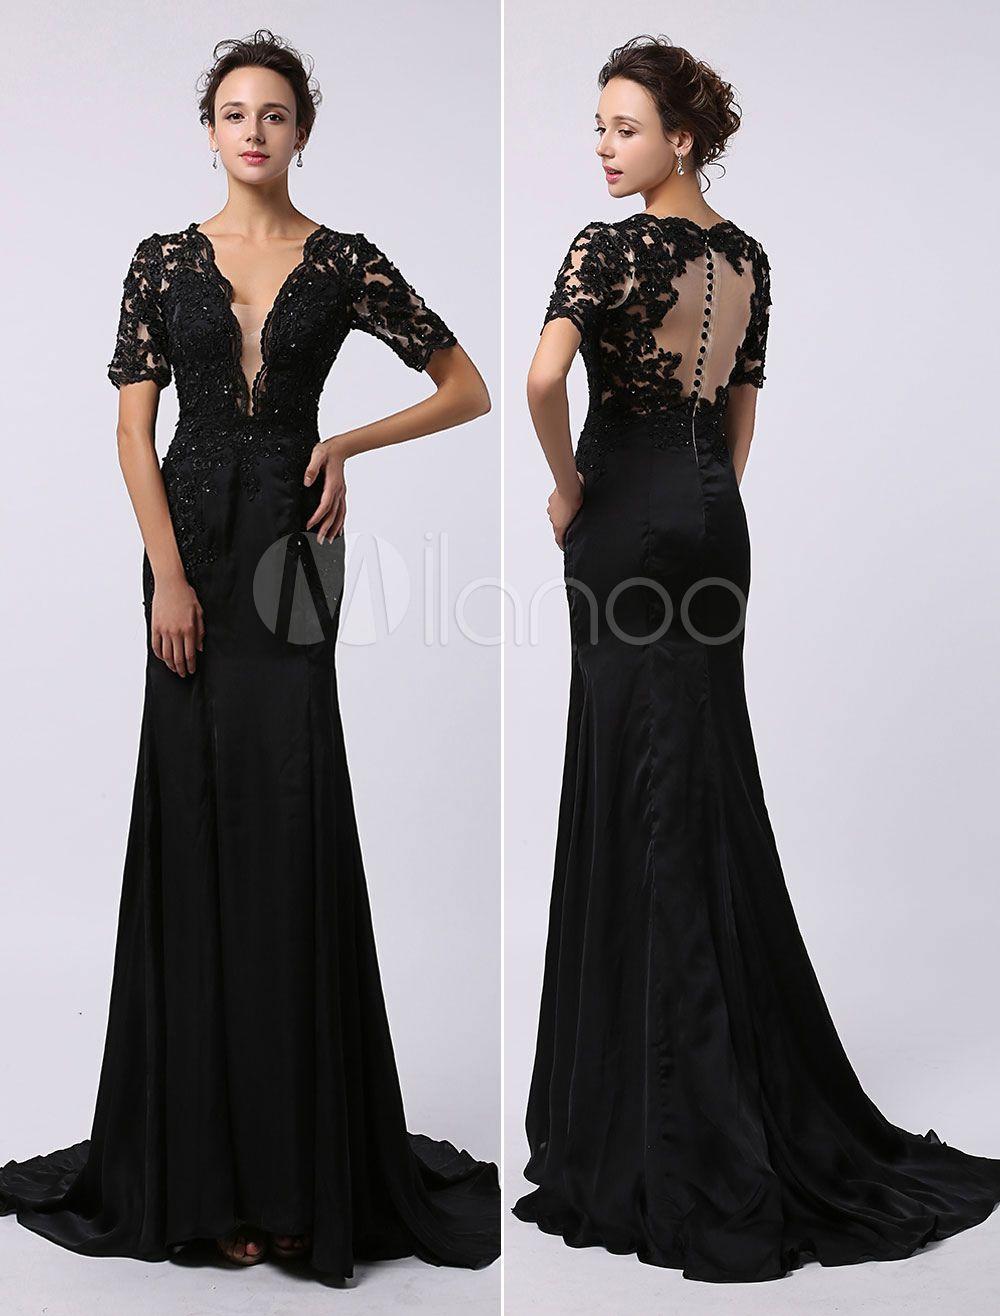 edee3ae101 Black Wedding Bridal Prom Dresses 2017 Long Backless Evening Dress Illusion  Lace Applique Deep V Neck Short Sleeves Keyhole Buttons Back Court Train  Milanoo